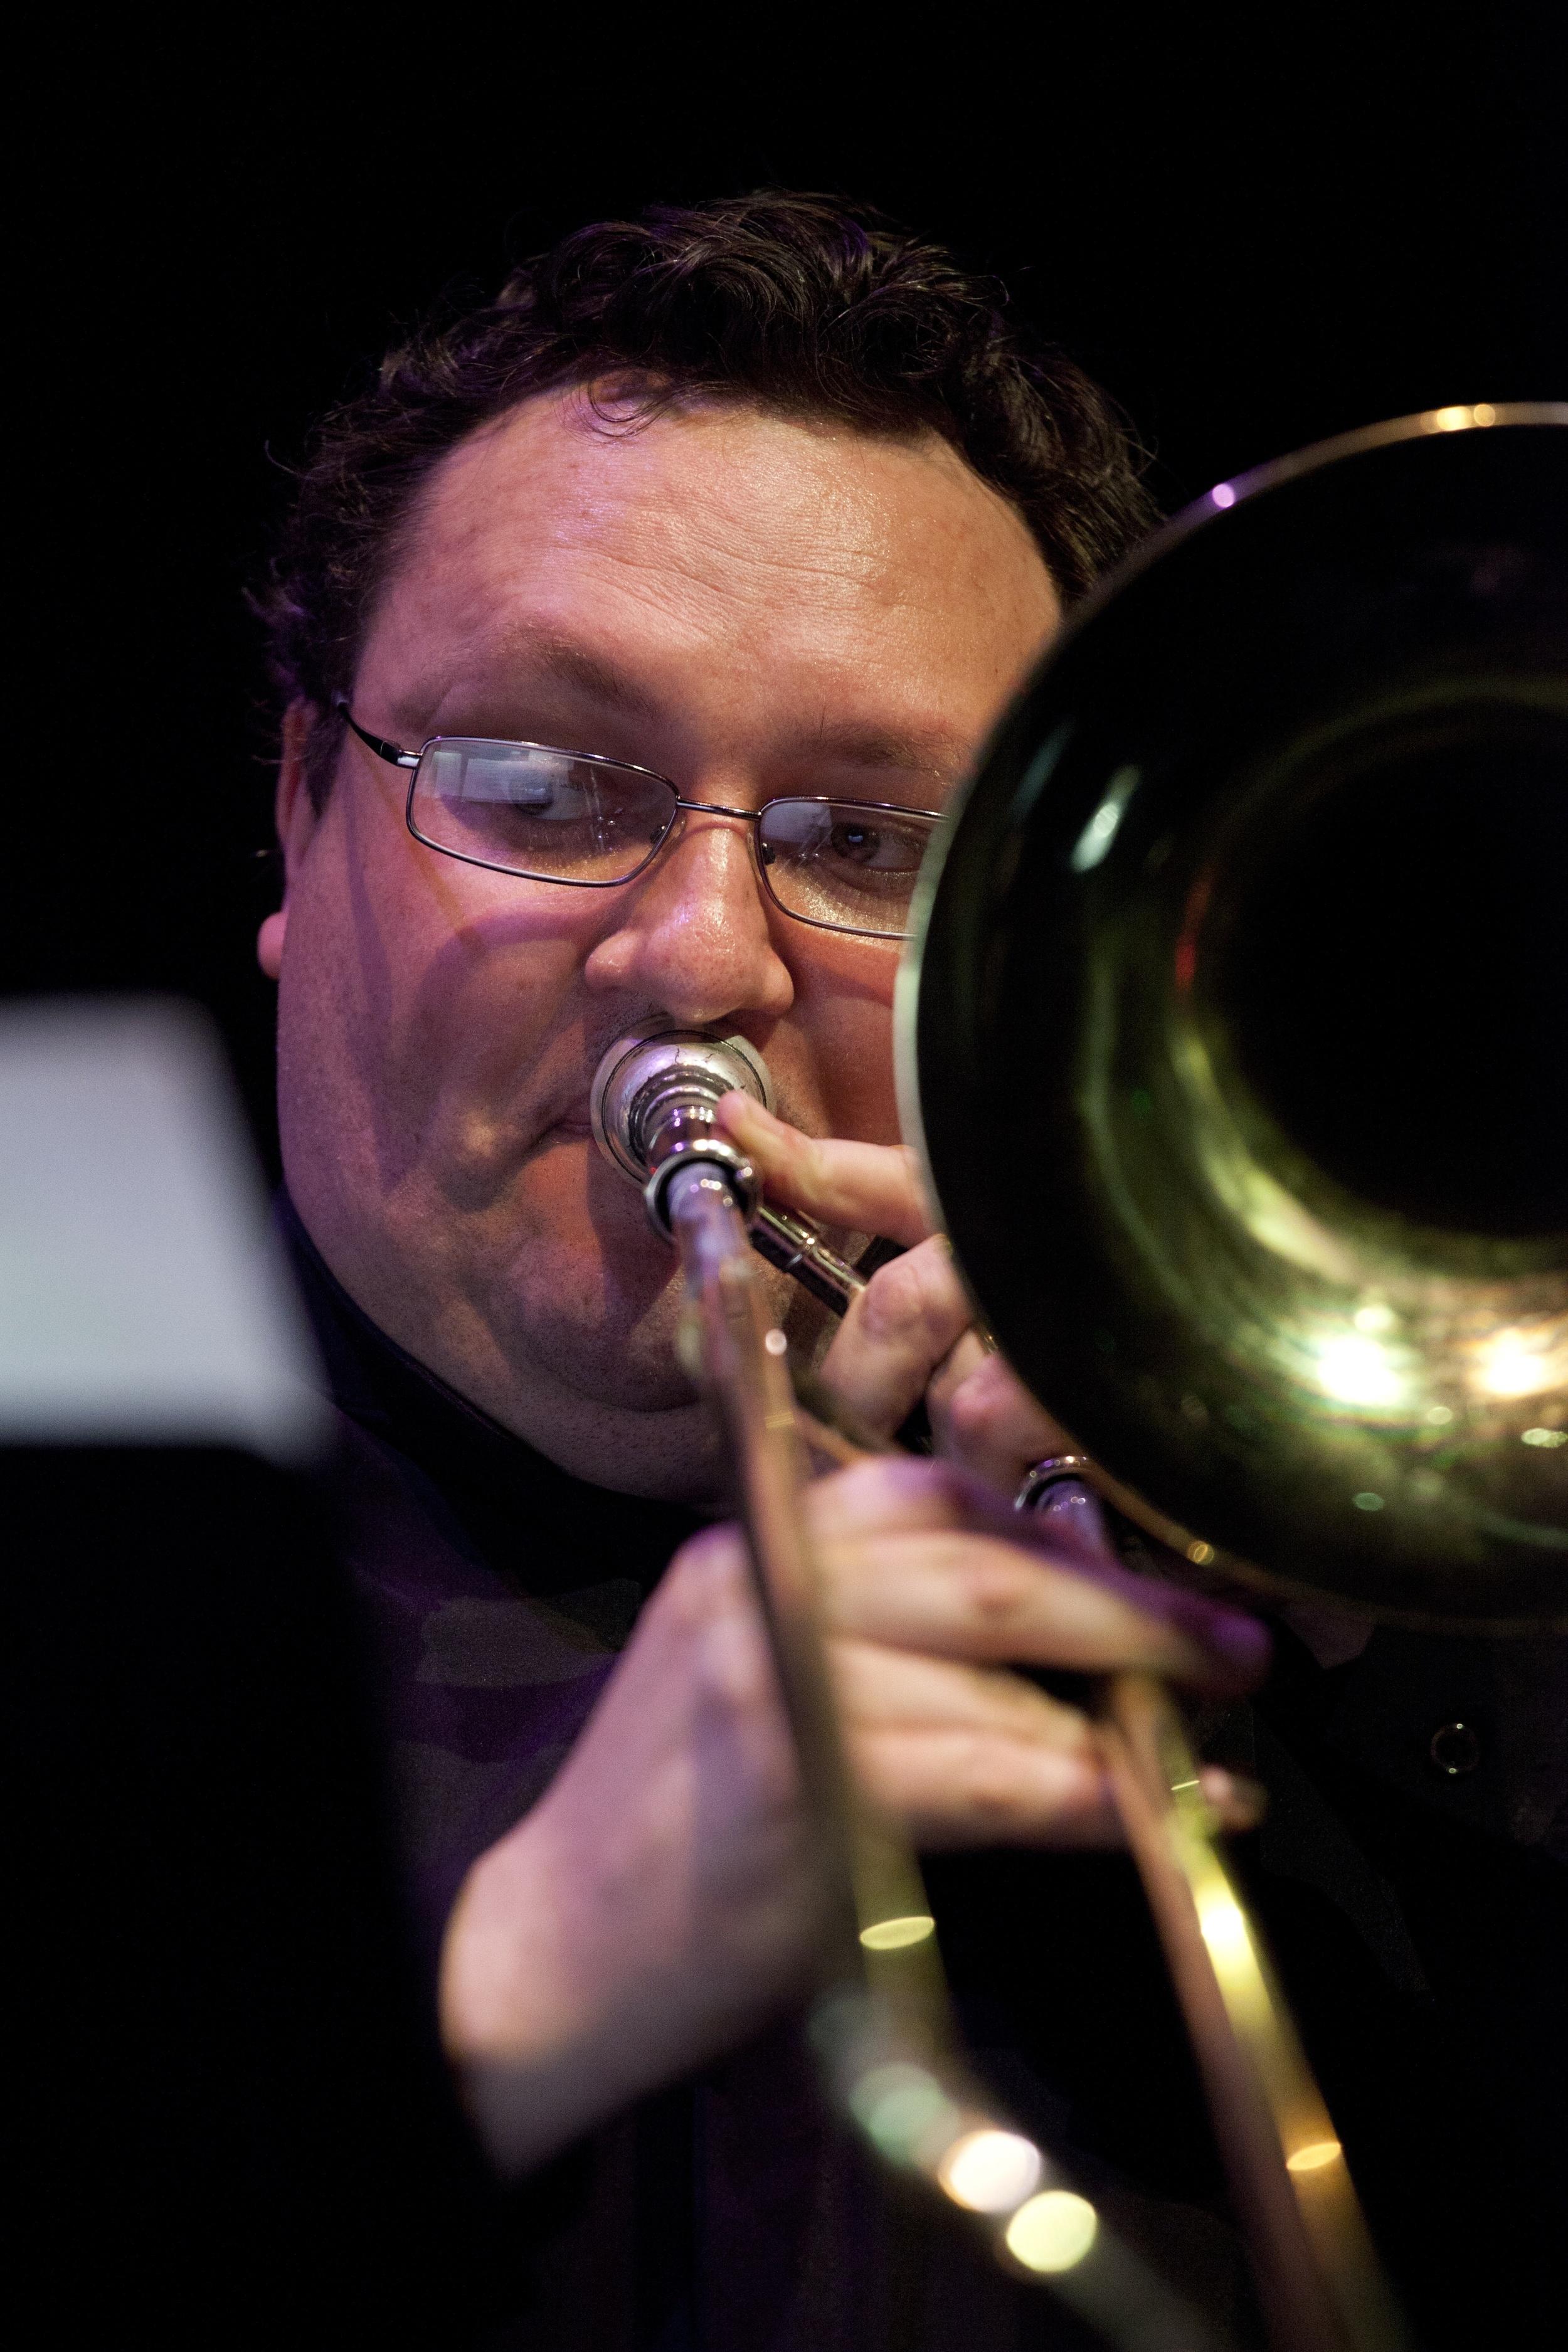 Adrian Sherriff